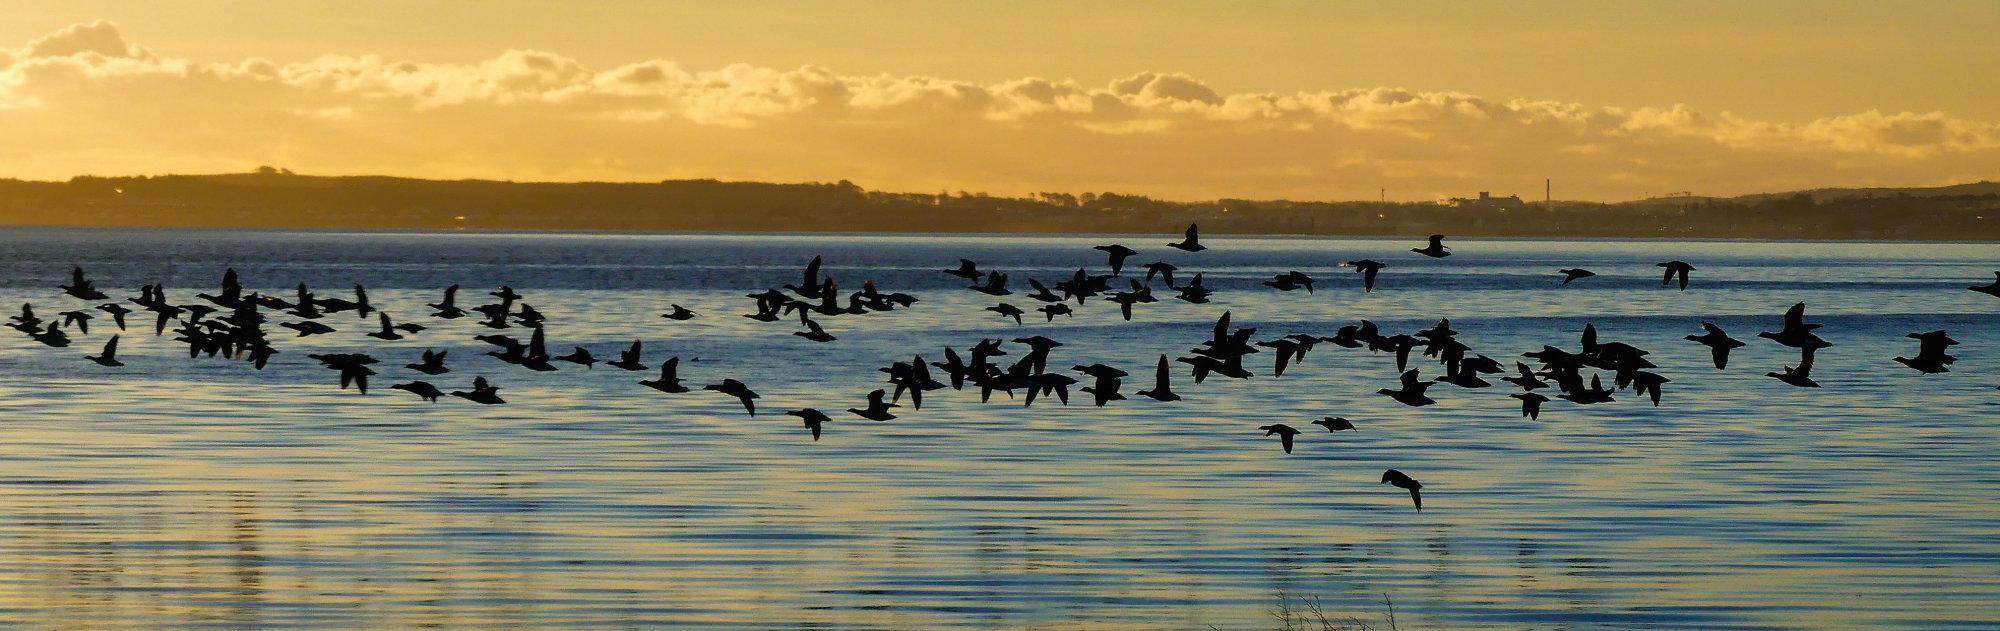 Freezing Morning Geese in flight